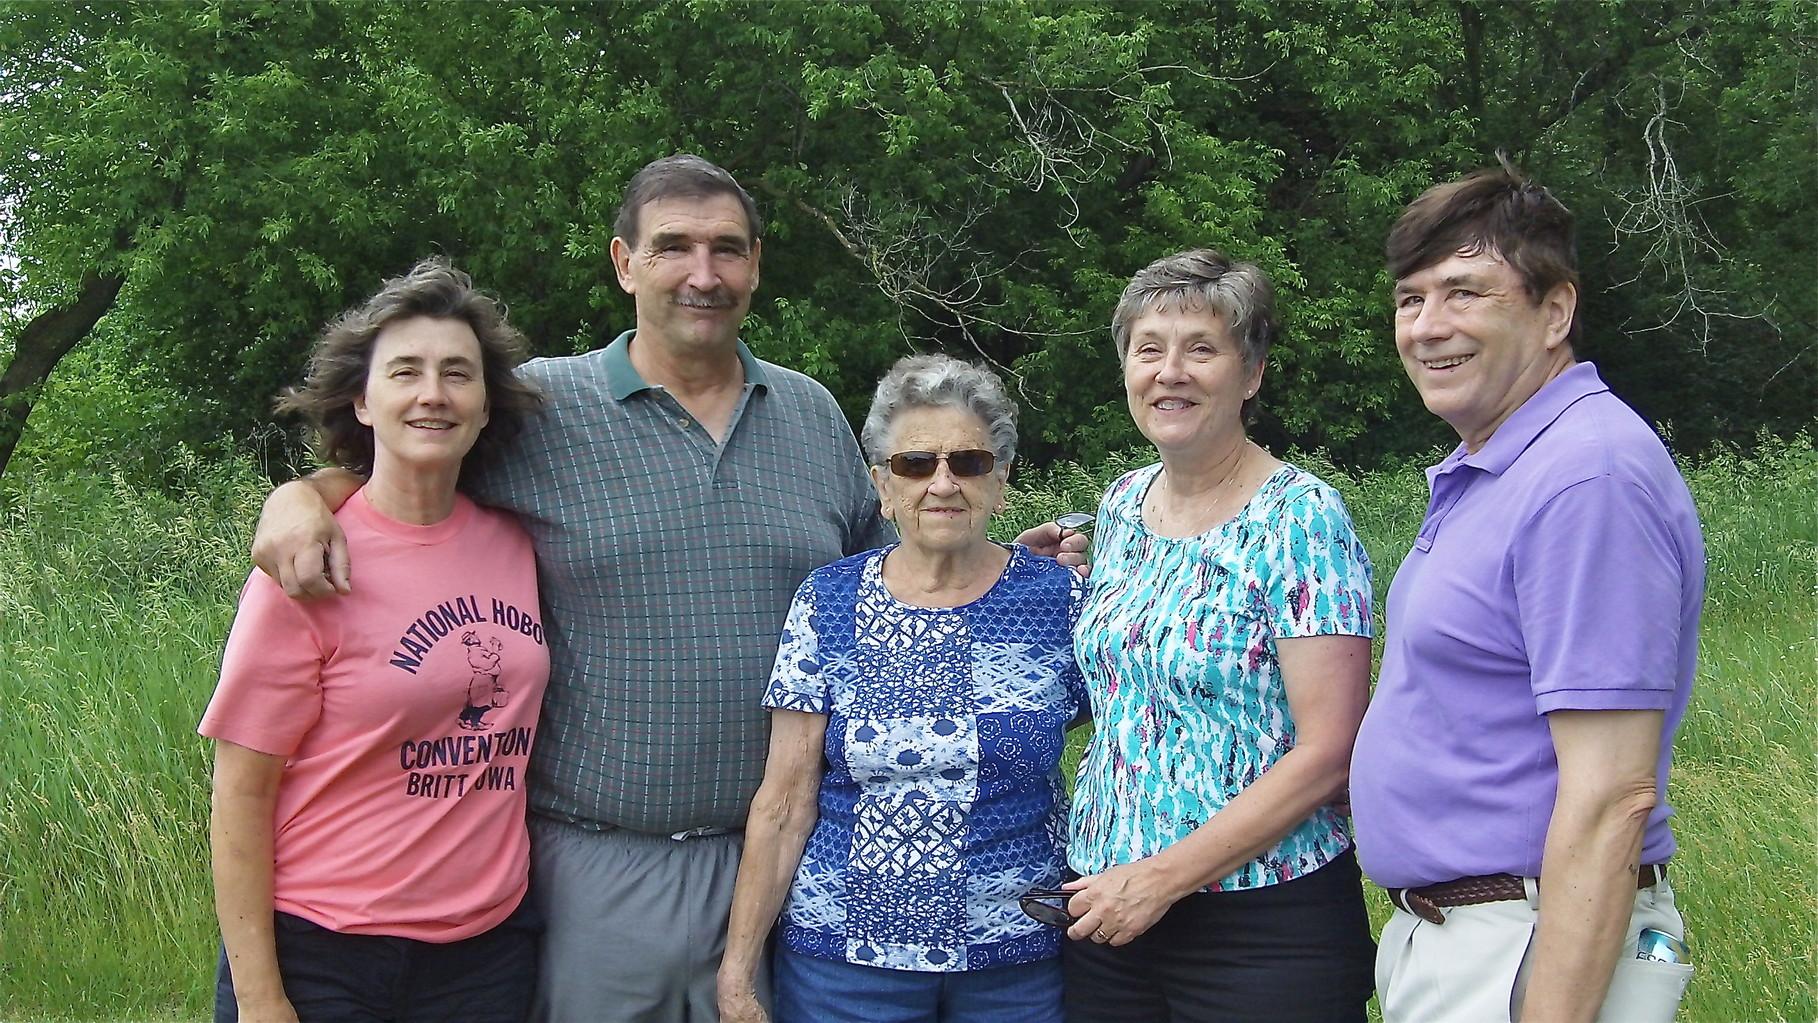 Ann, Paul, Mary Lou, Cindy, & John Wagner. (Mary Lou & her 4 children!)